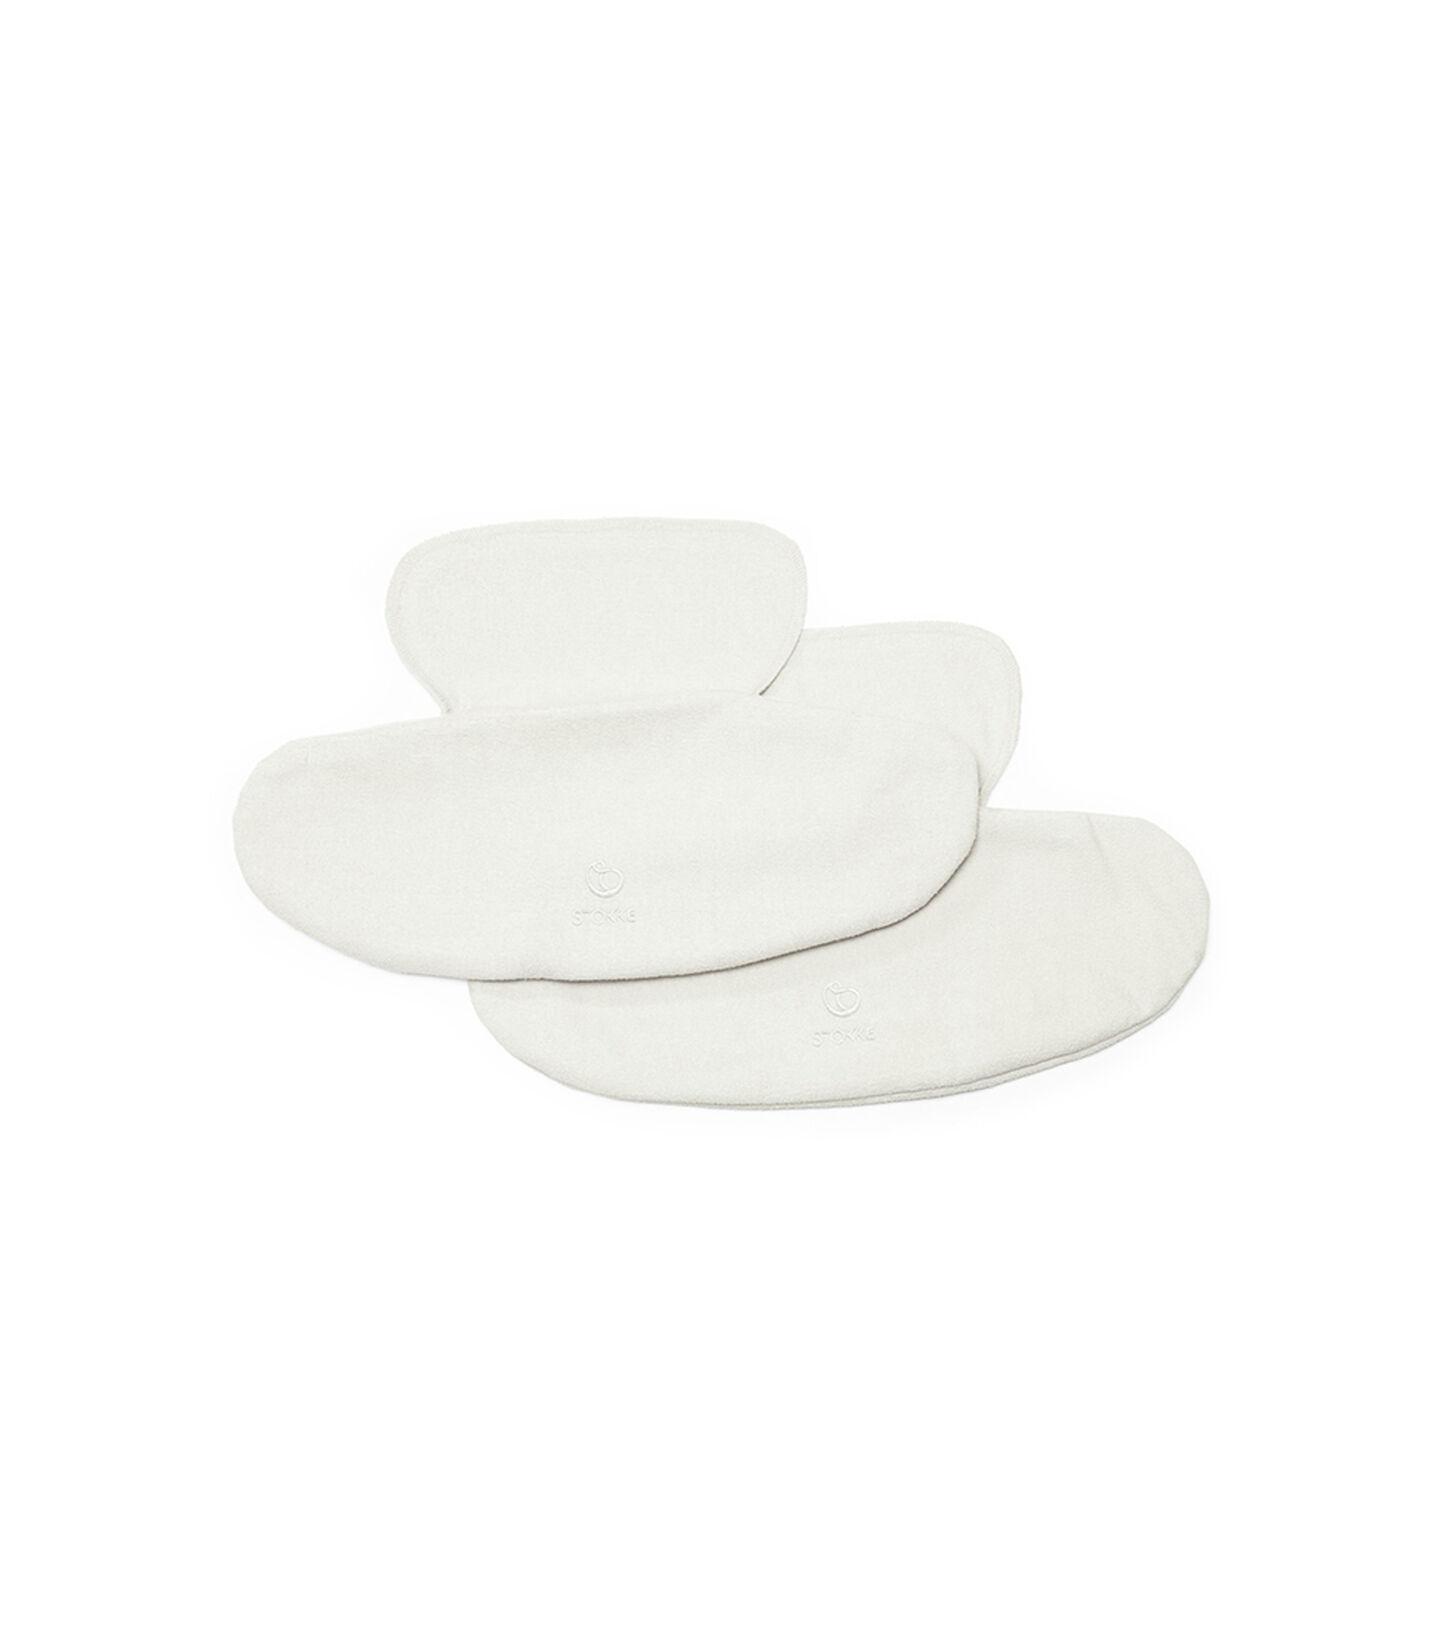 Stokke® MyCarrier™ smekke, hvit, White, mainview view 2